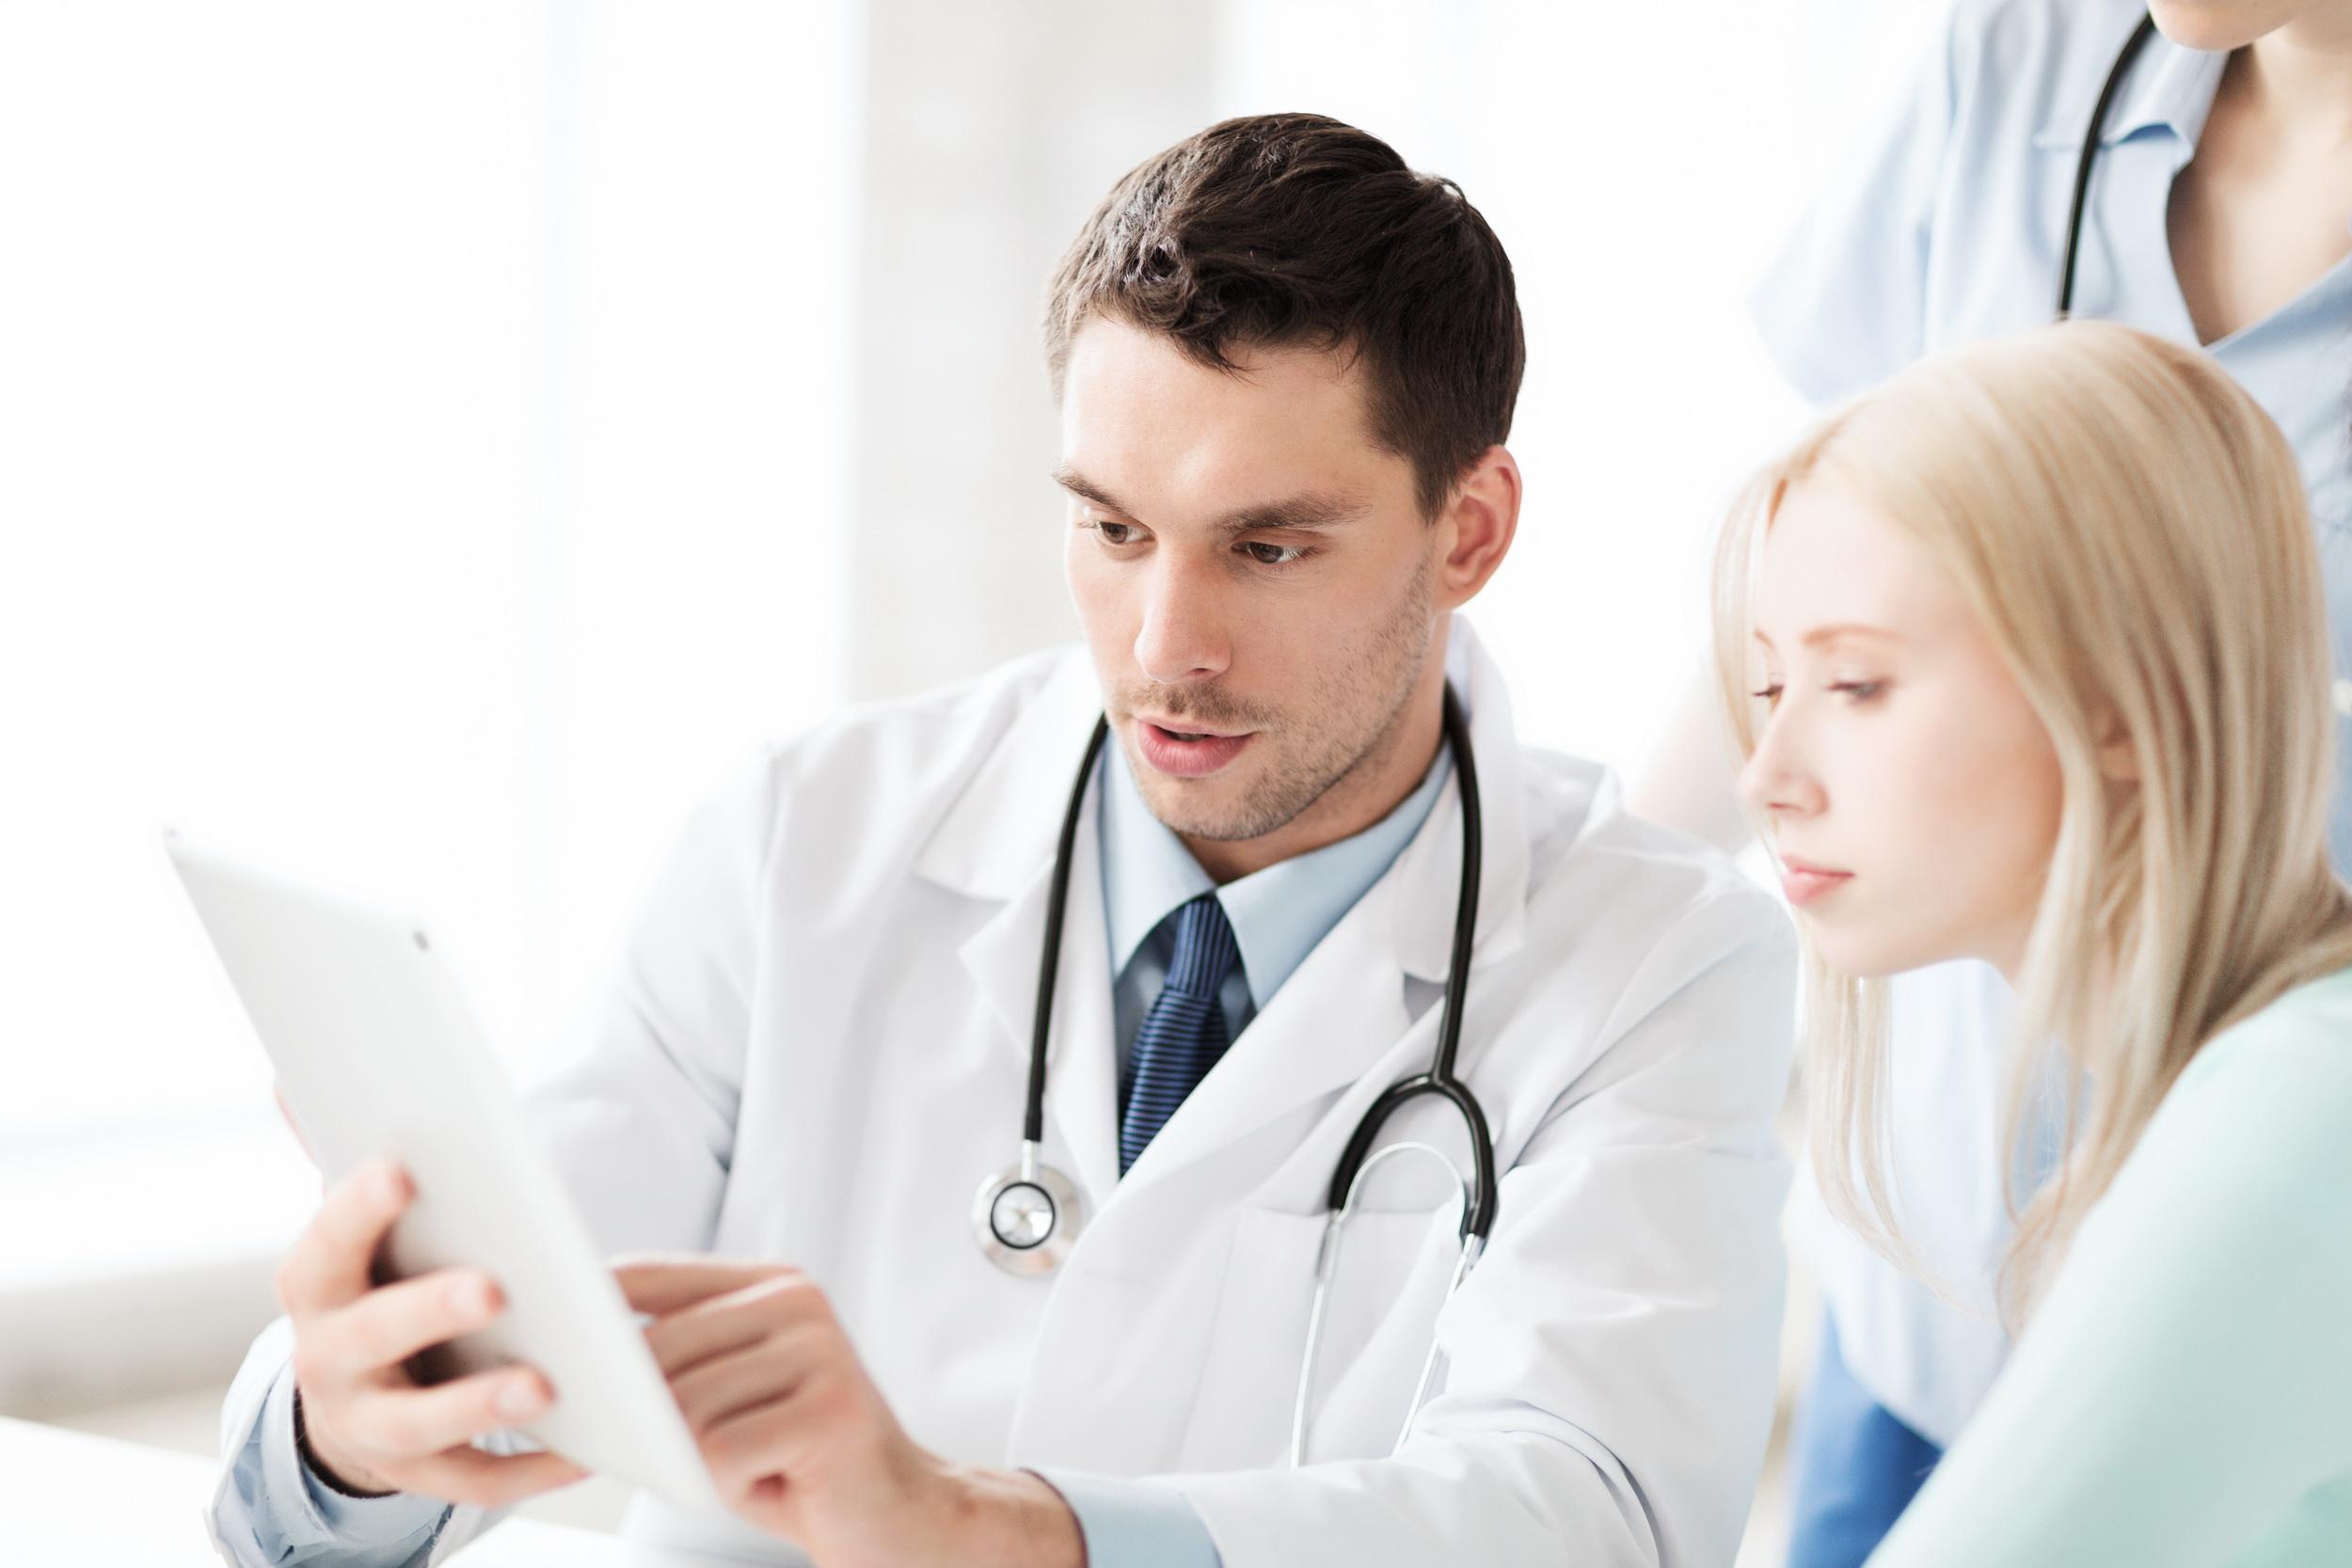 Фото женщина на осмотре у врача 17 фотография